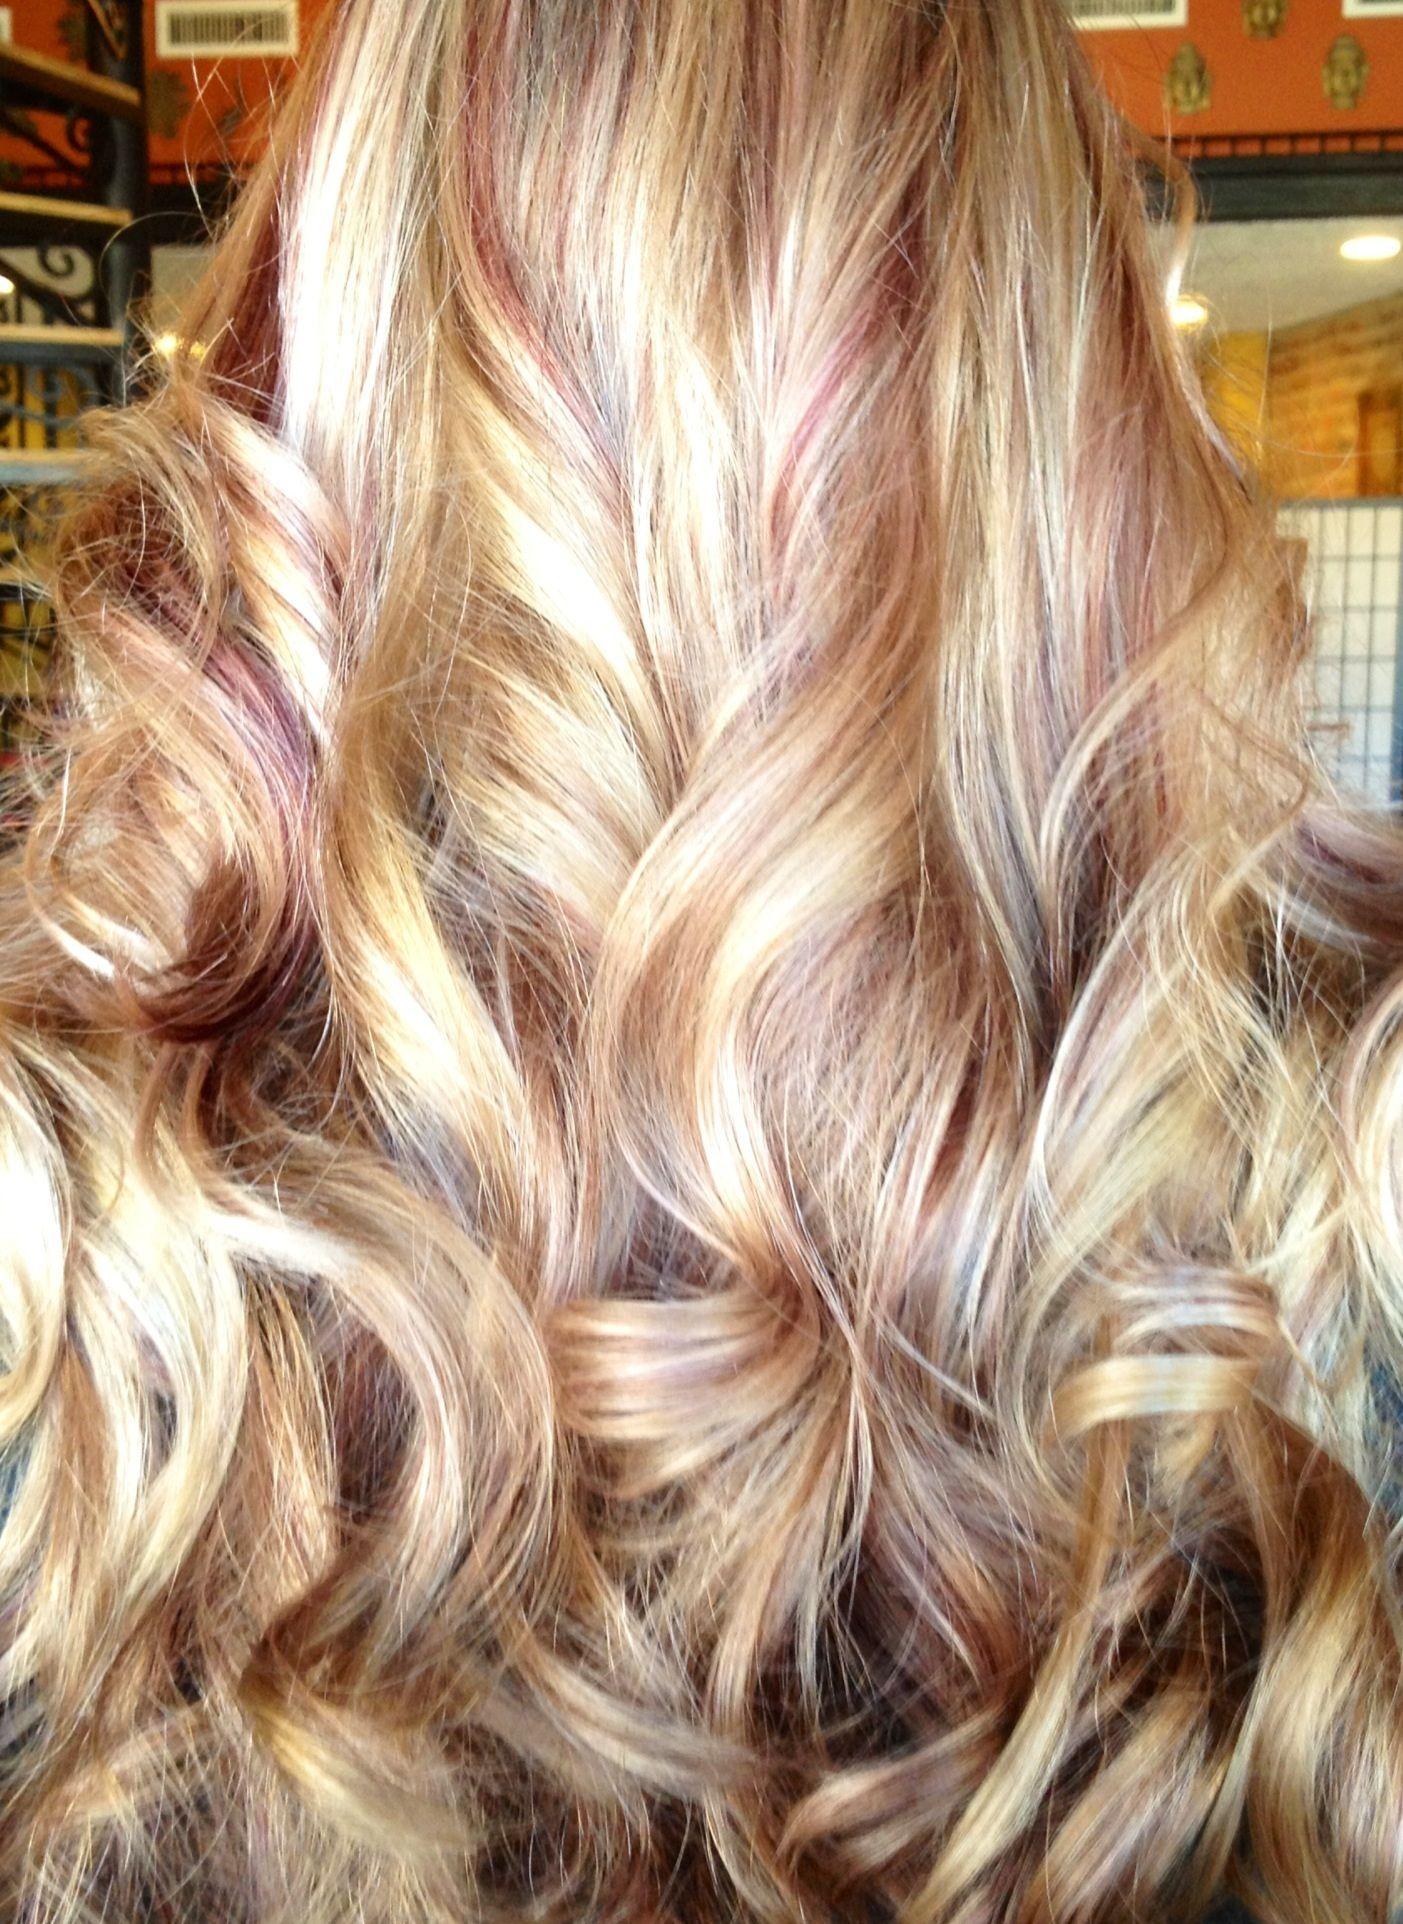 Blonde Wth Red And Brown Lowlights Hair Highlights Bleach Blonde Hair Hair Styles